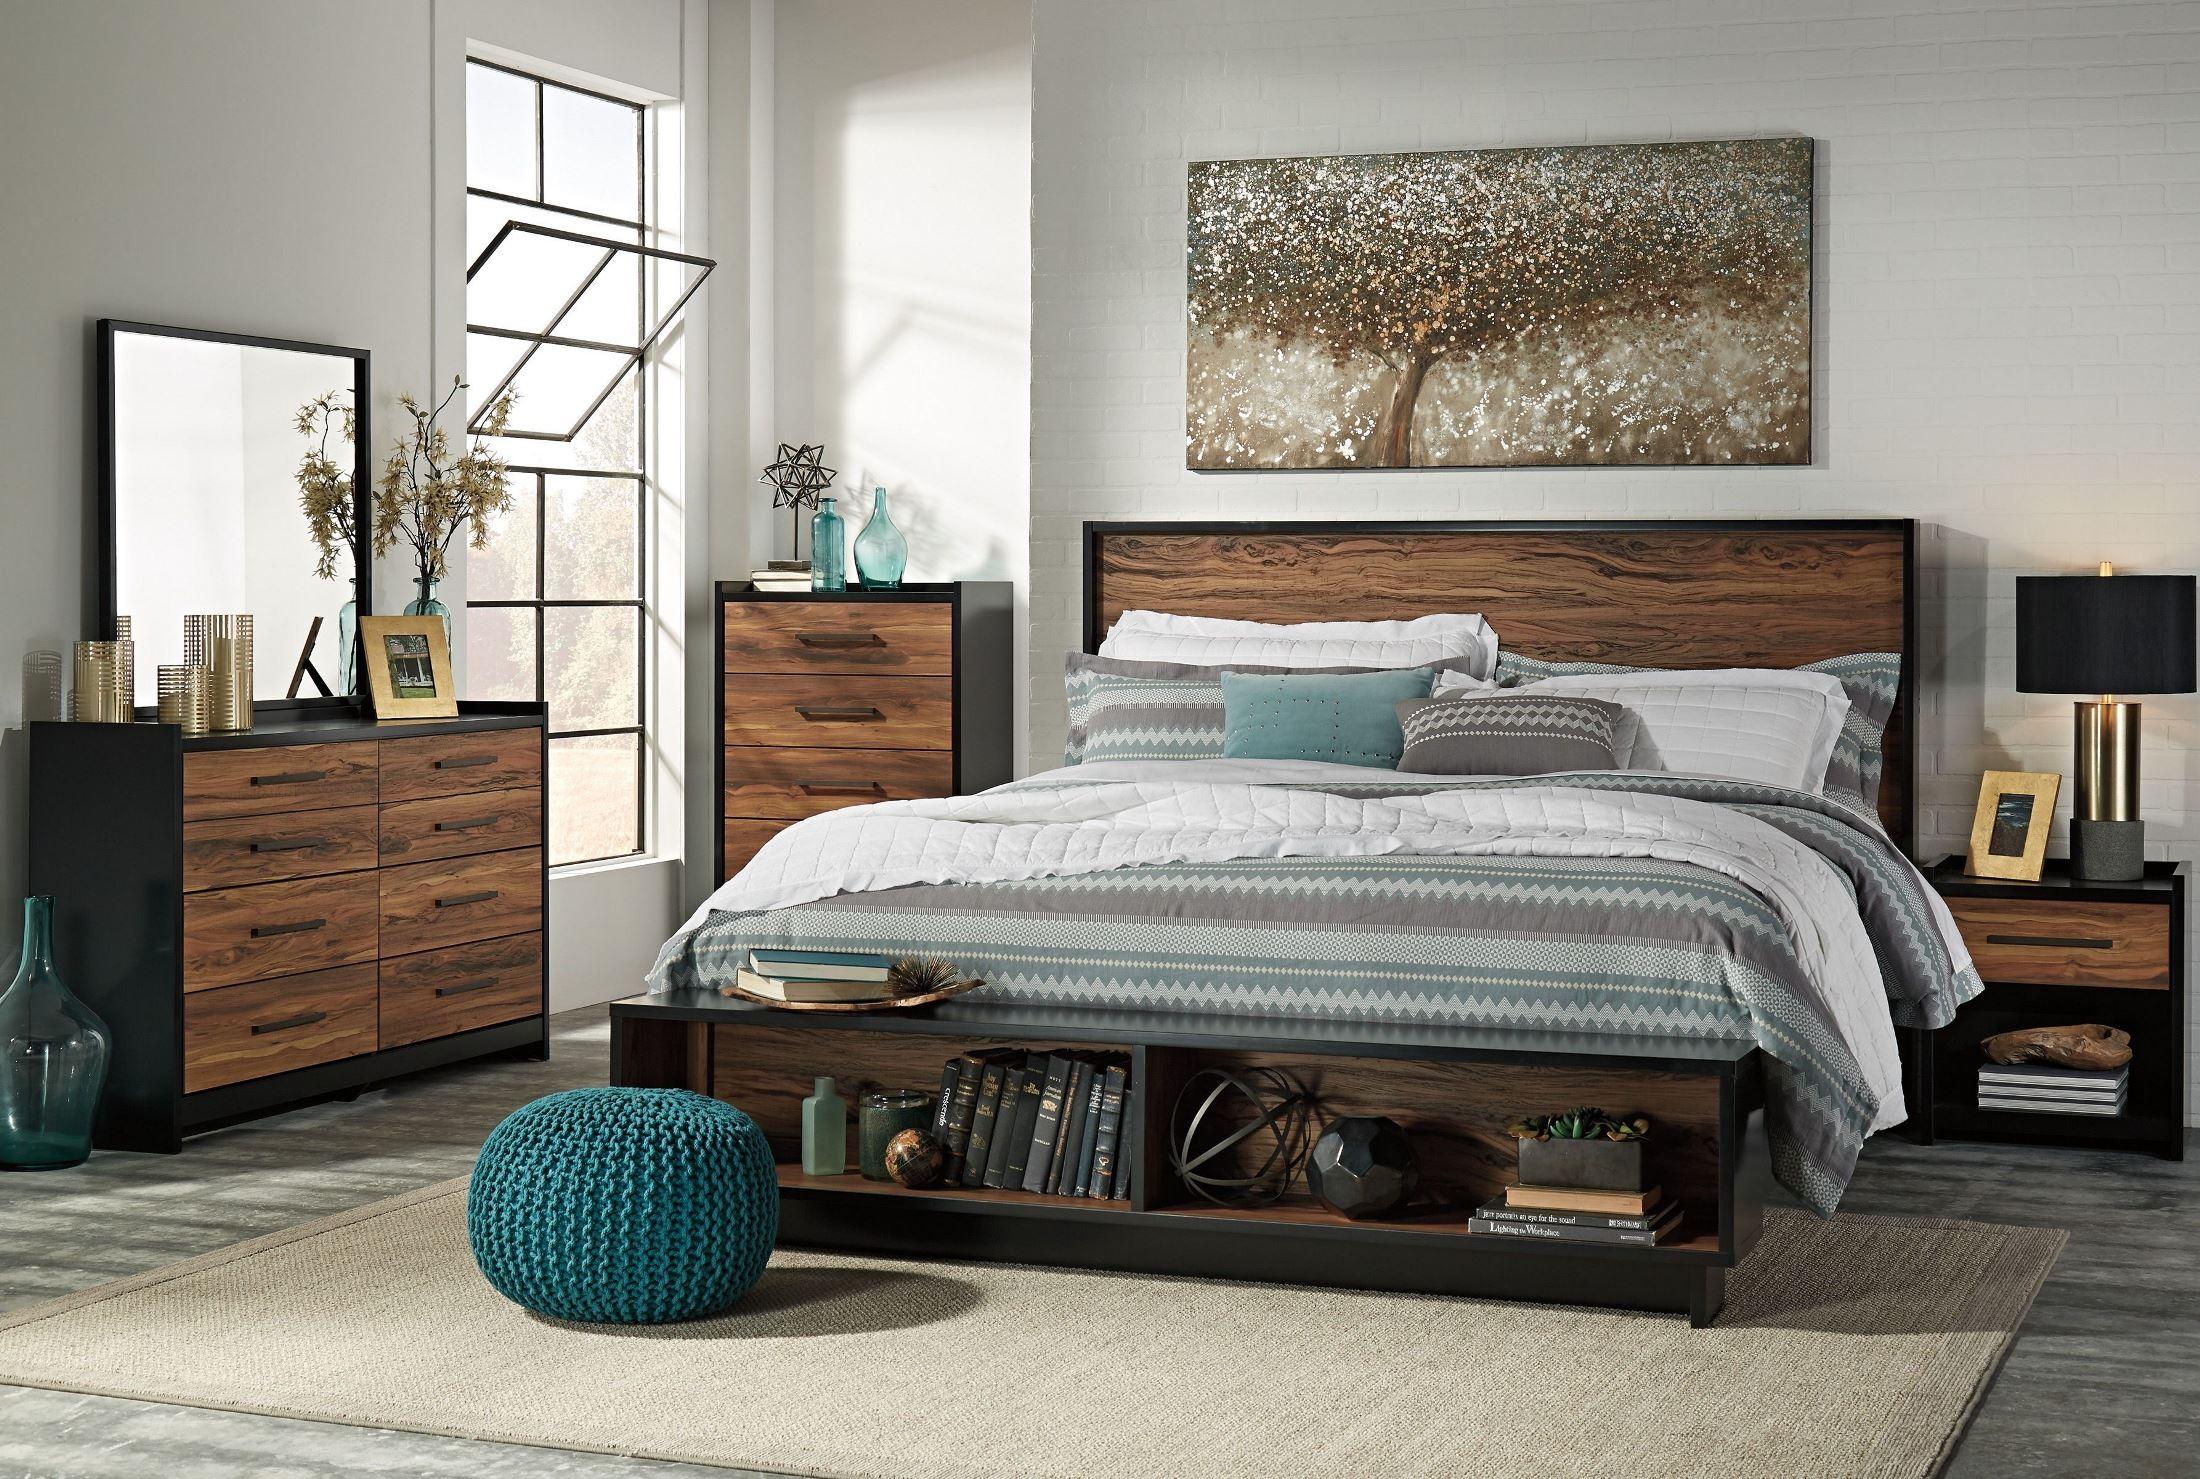 Stavani Black And Brown Panel Storage Bedroom Set From Ashley Coleman Furniture